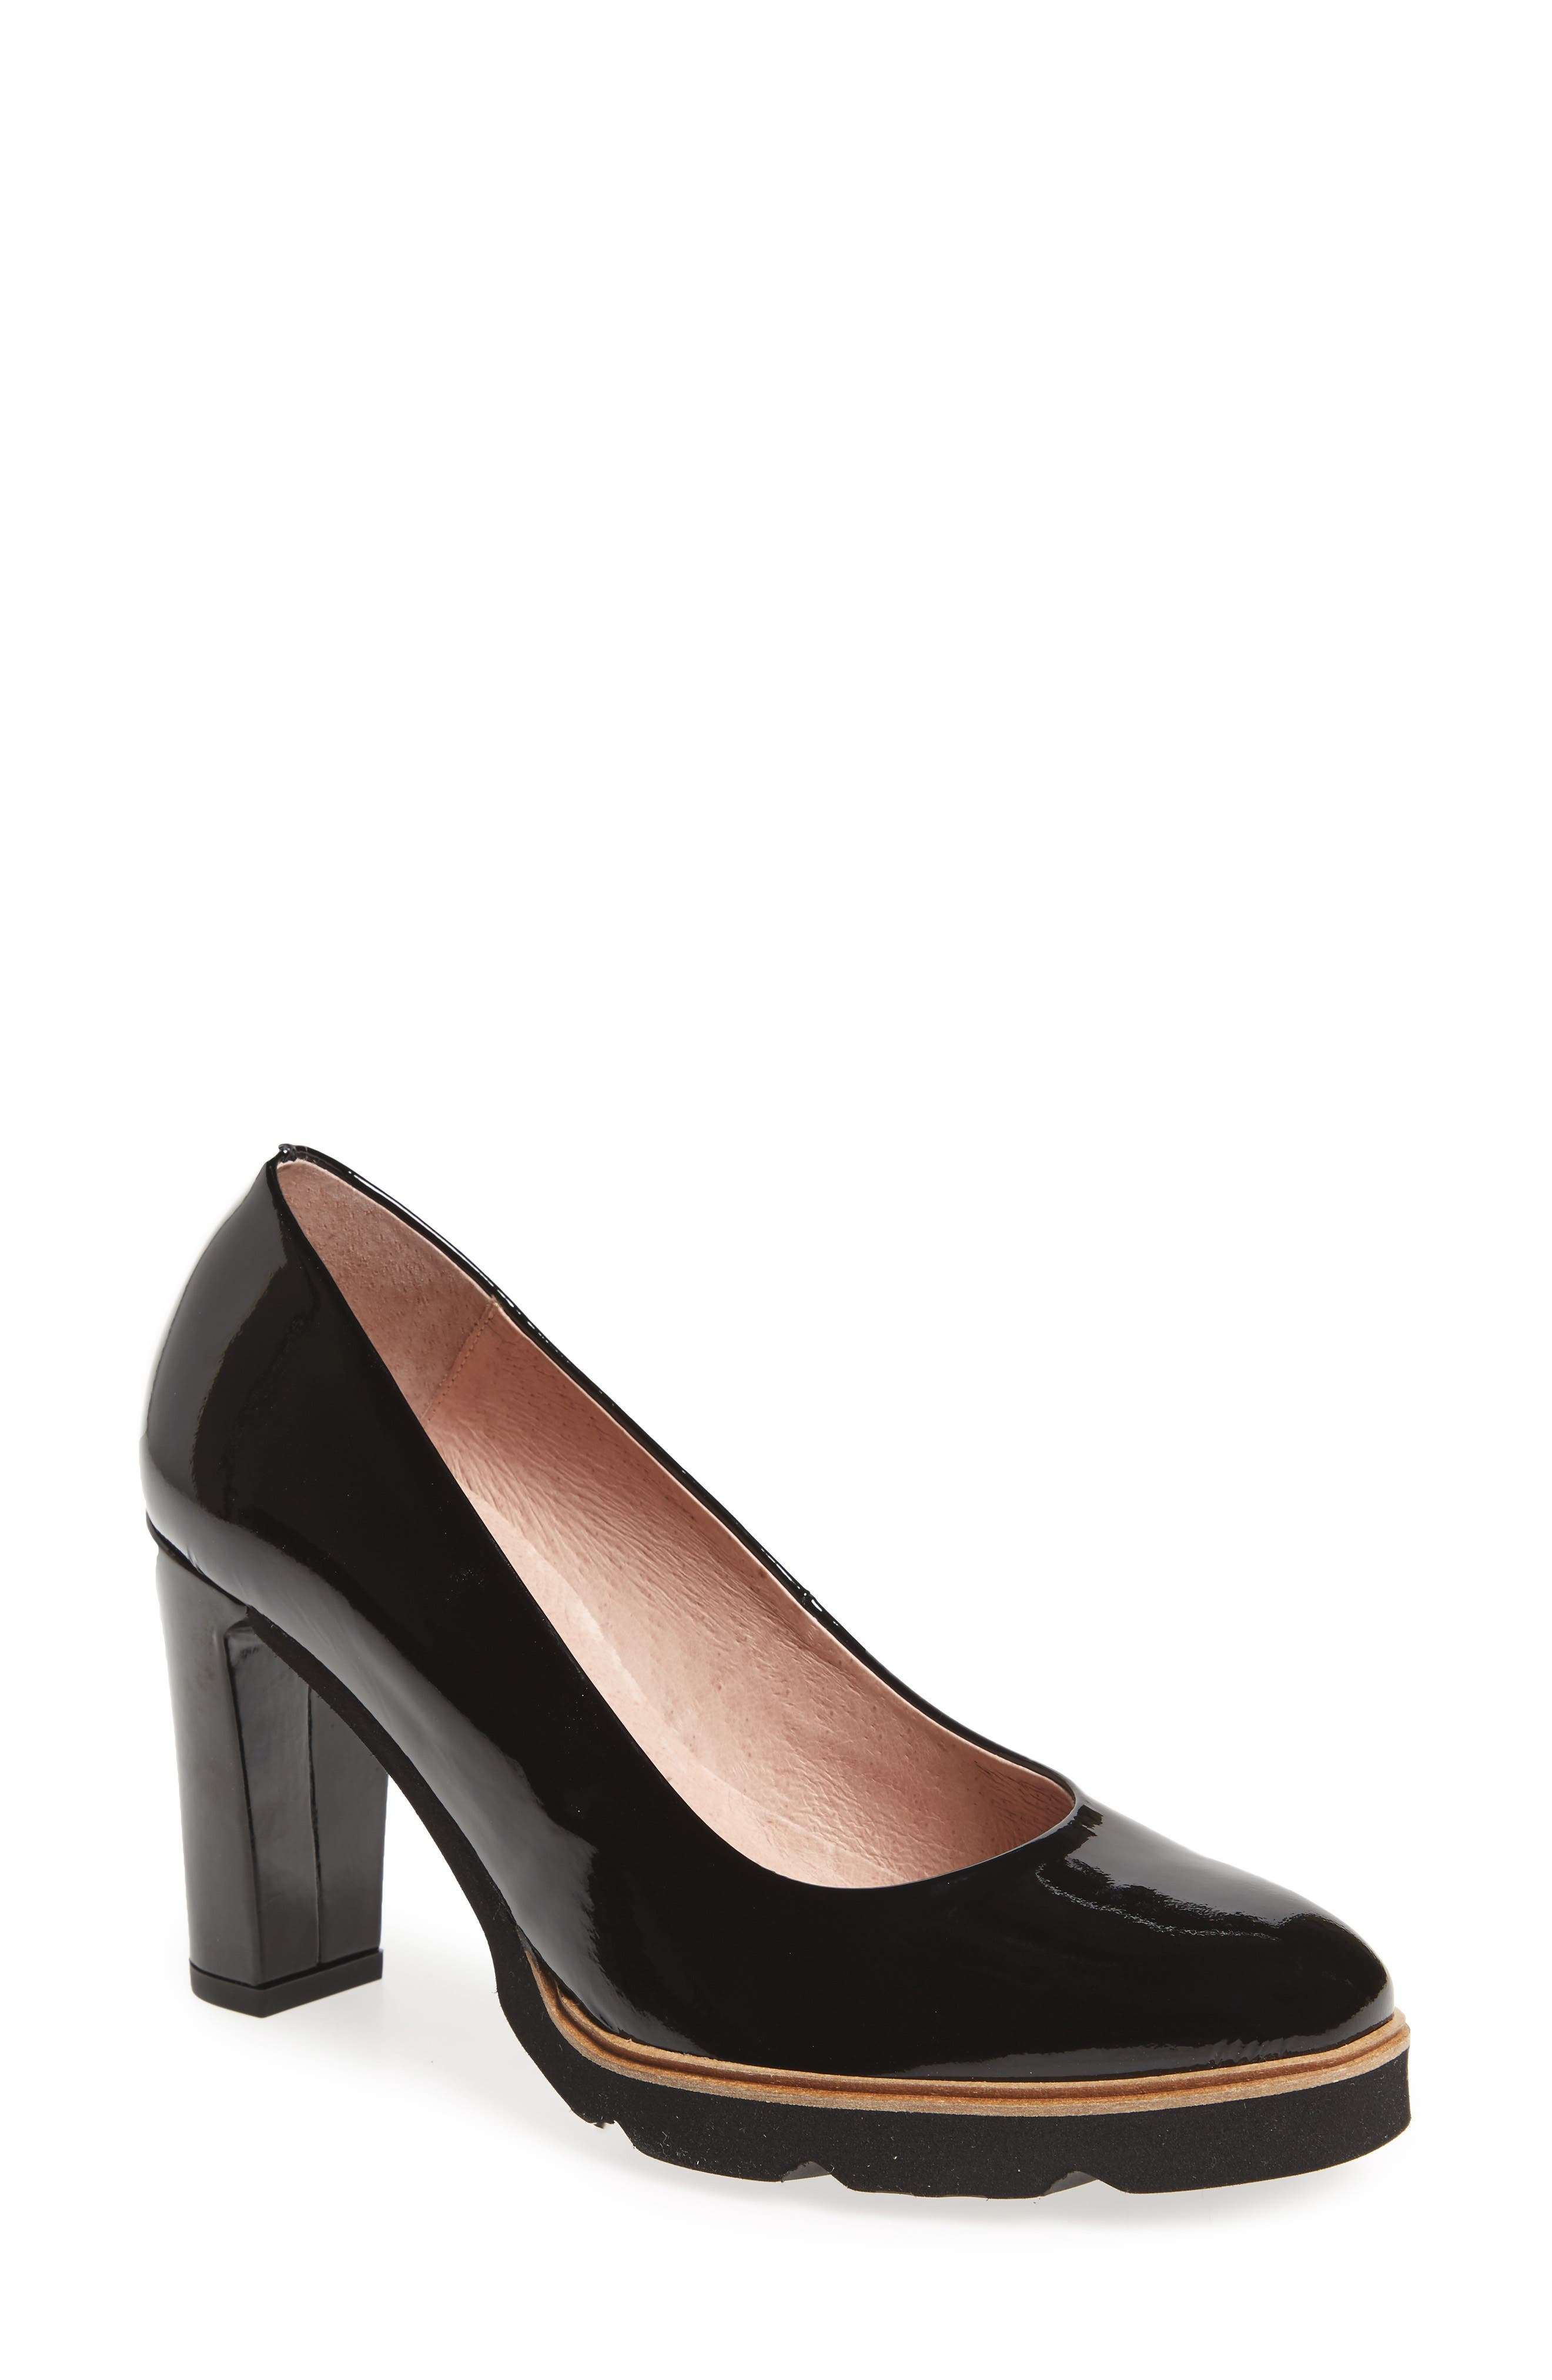 7dda9d6683a4 Women s Wonders Shoes